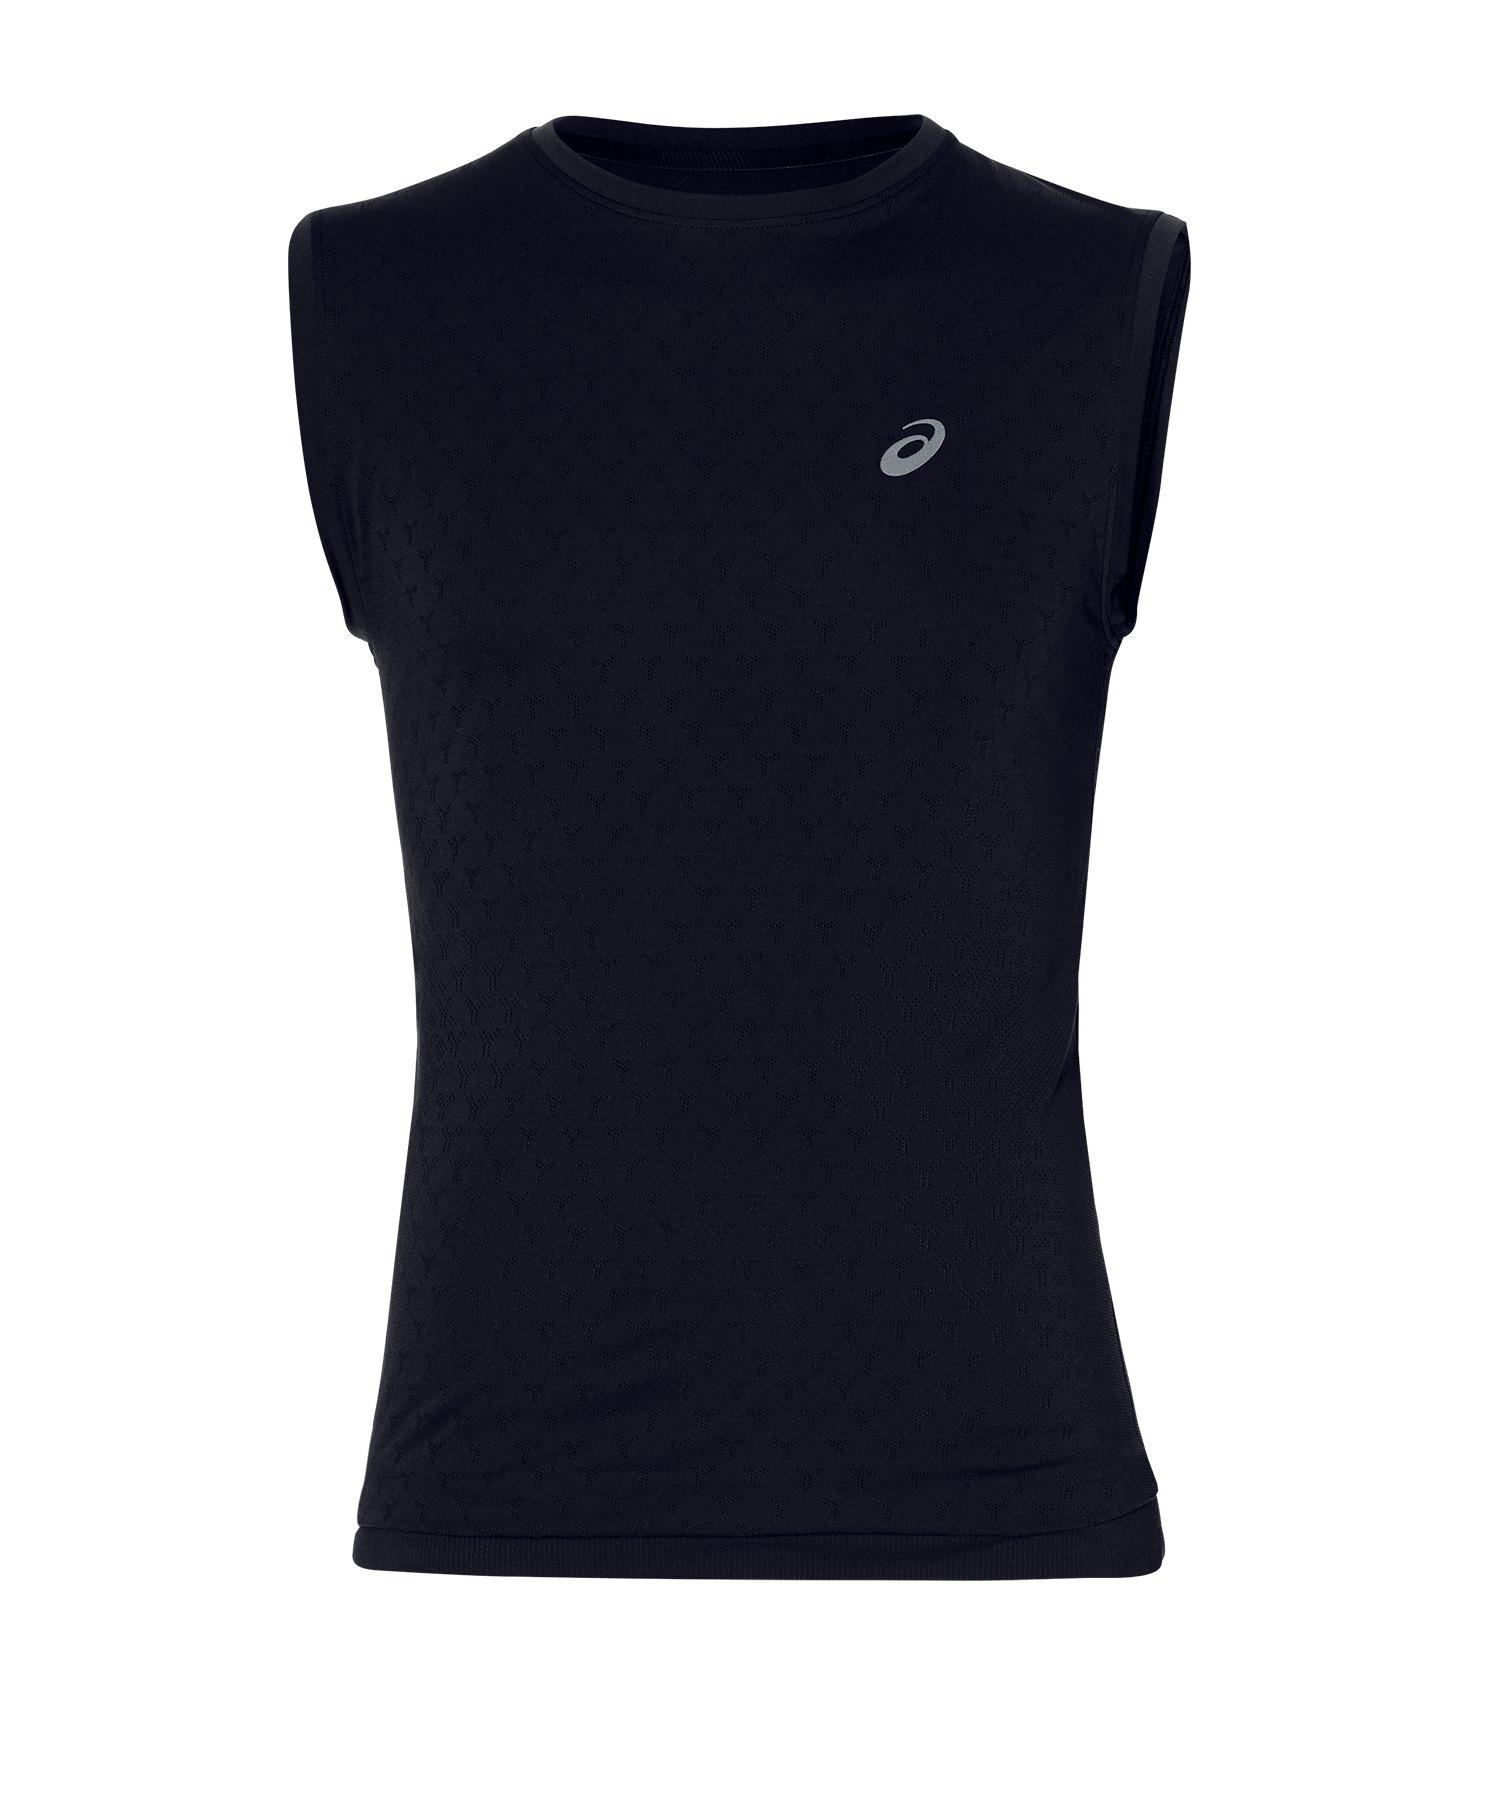 Asics Gel-Cool Top T-Shirt Running Schwarz F001 - schwarz